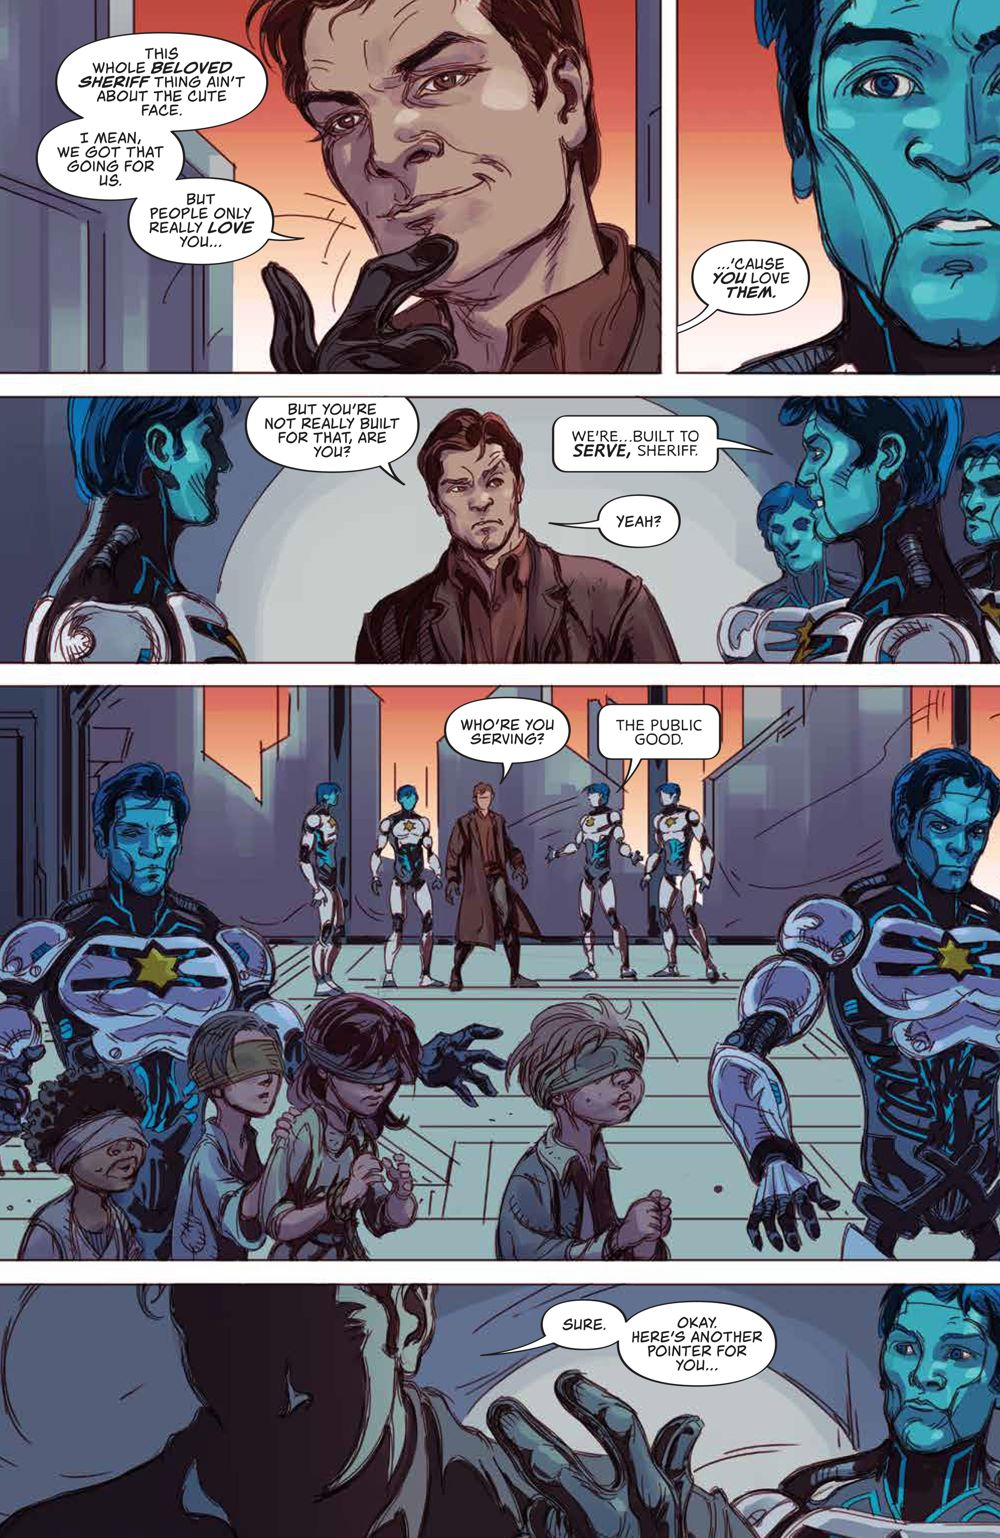 Firefly_BlueSunRising_v2_HC_21 ComicList Previews: FIREFLY BLUE SUN RISING VOLUME 2 HC